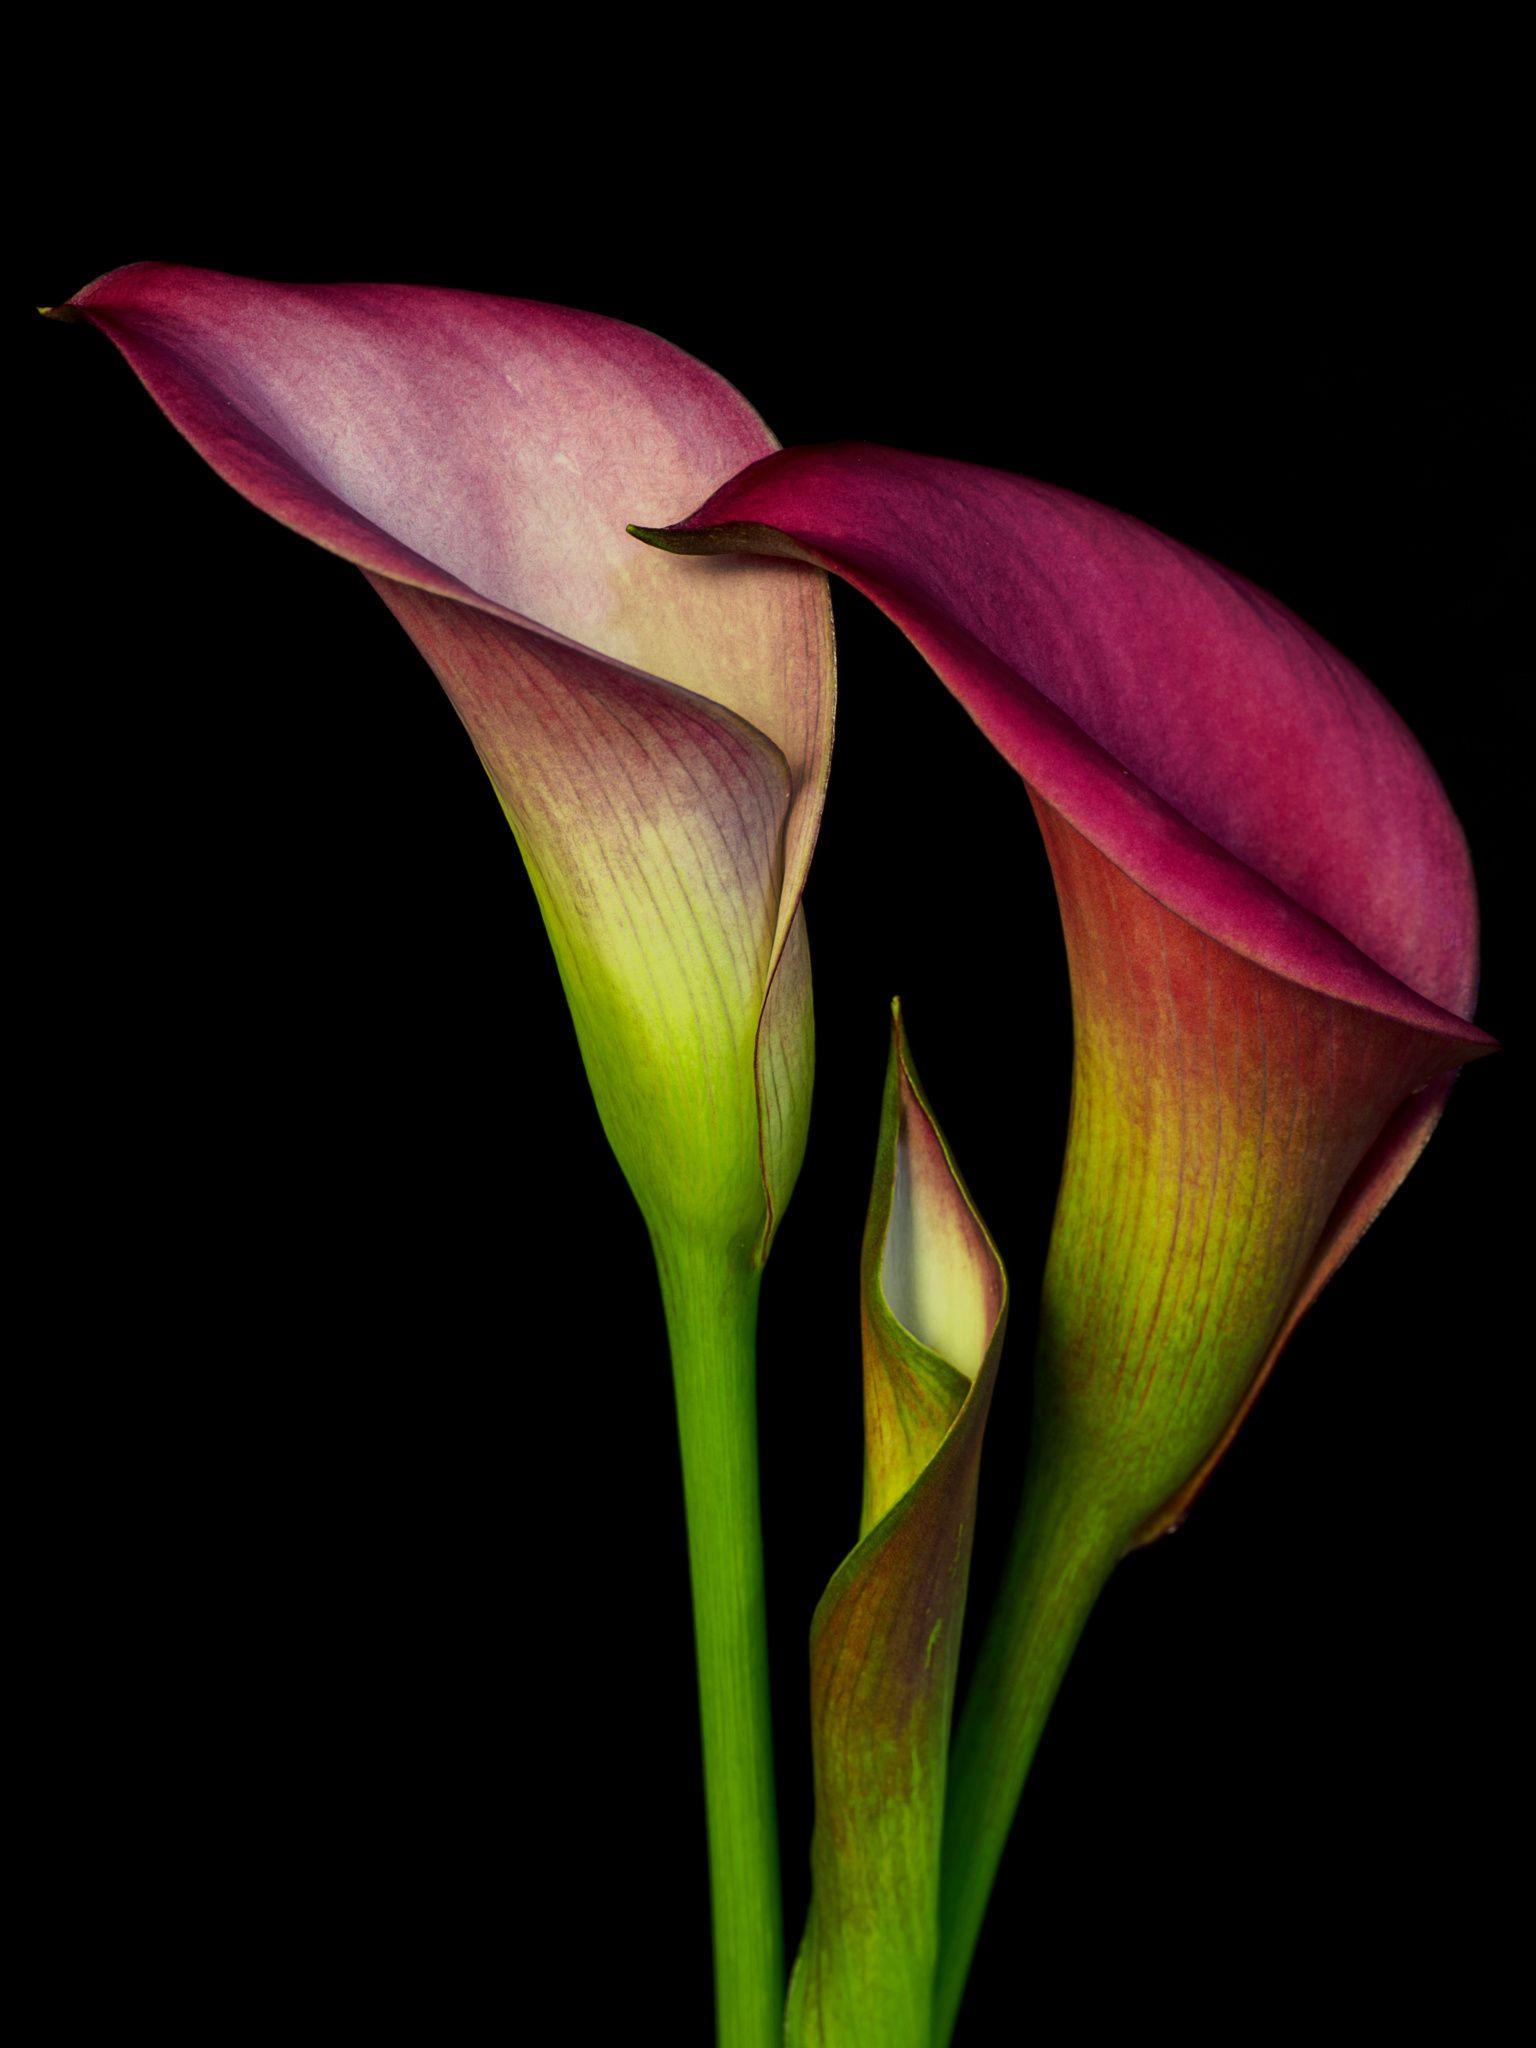 Three Calla Lillies Calla Lillies Flowers Photography Amazing Flowers